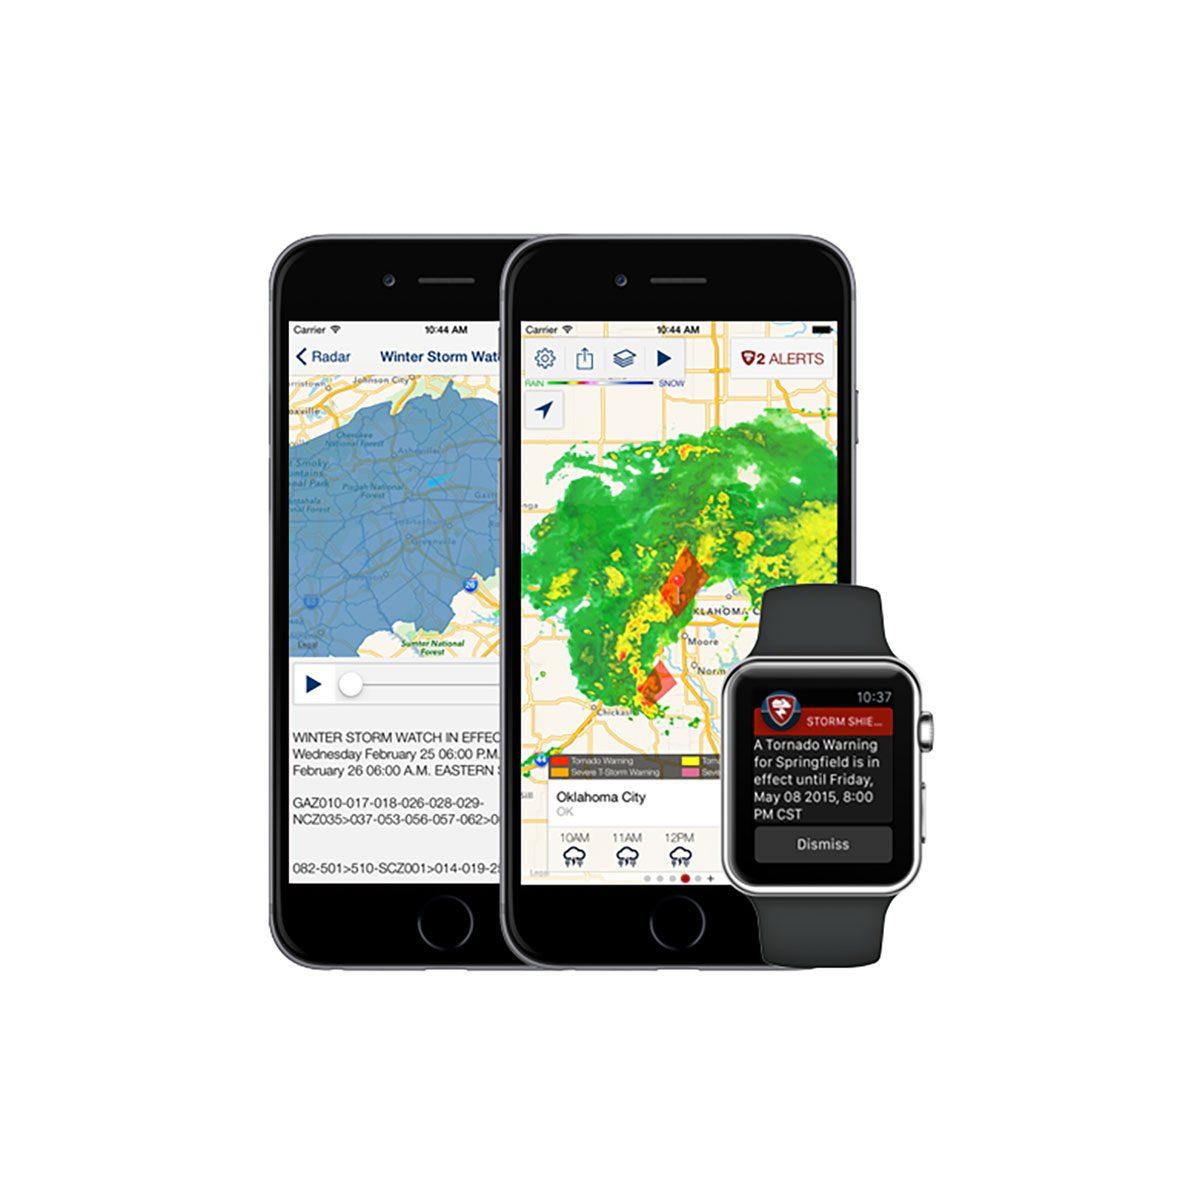 Sever weather warning app